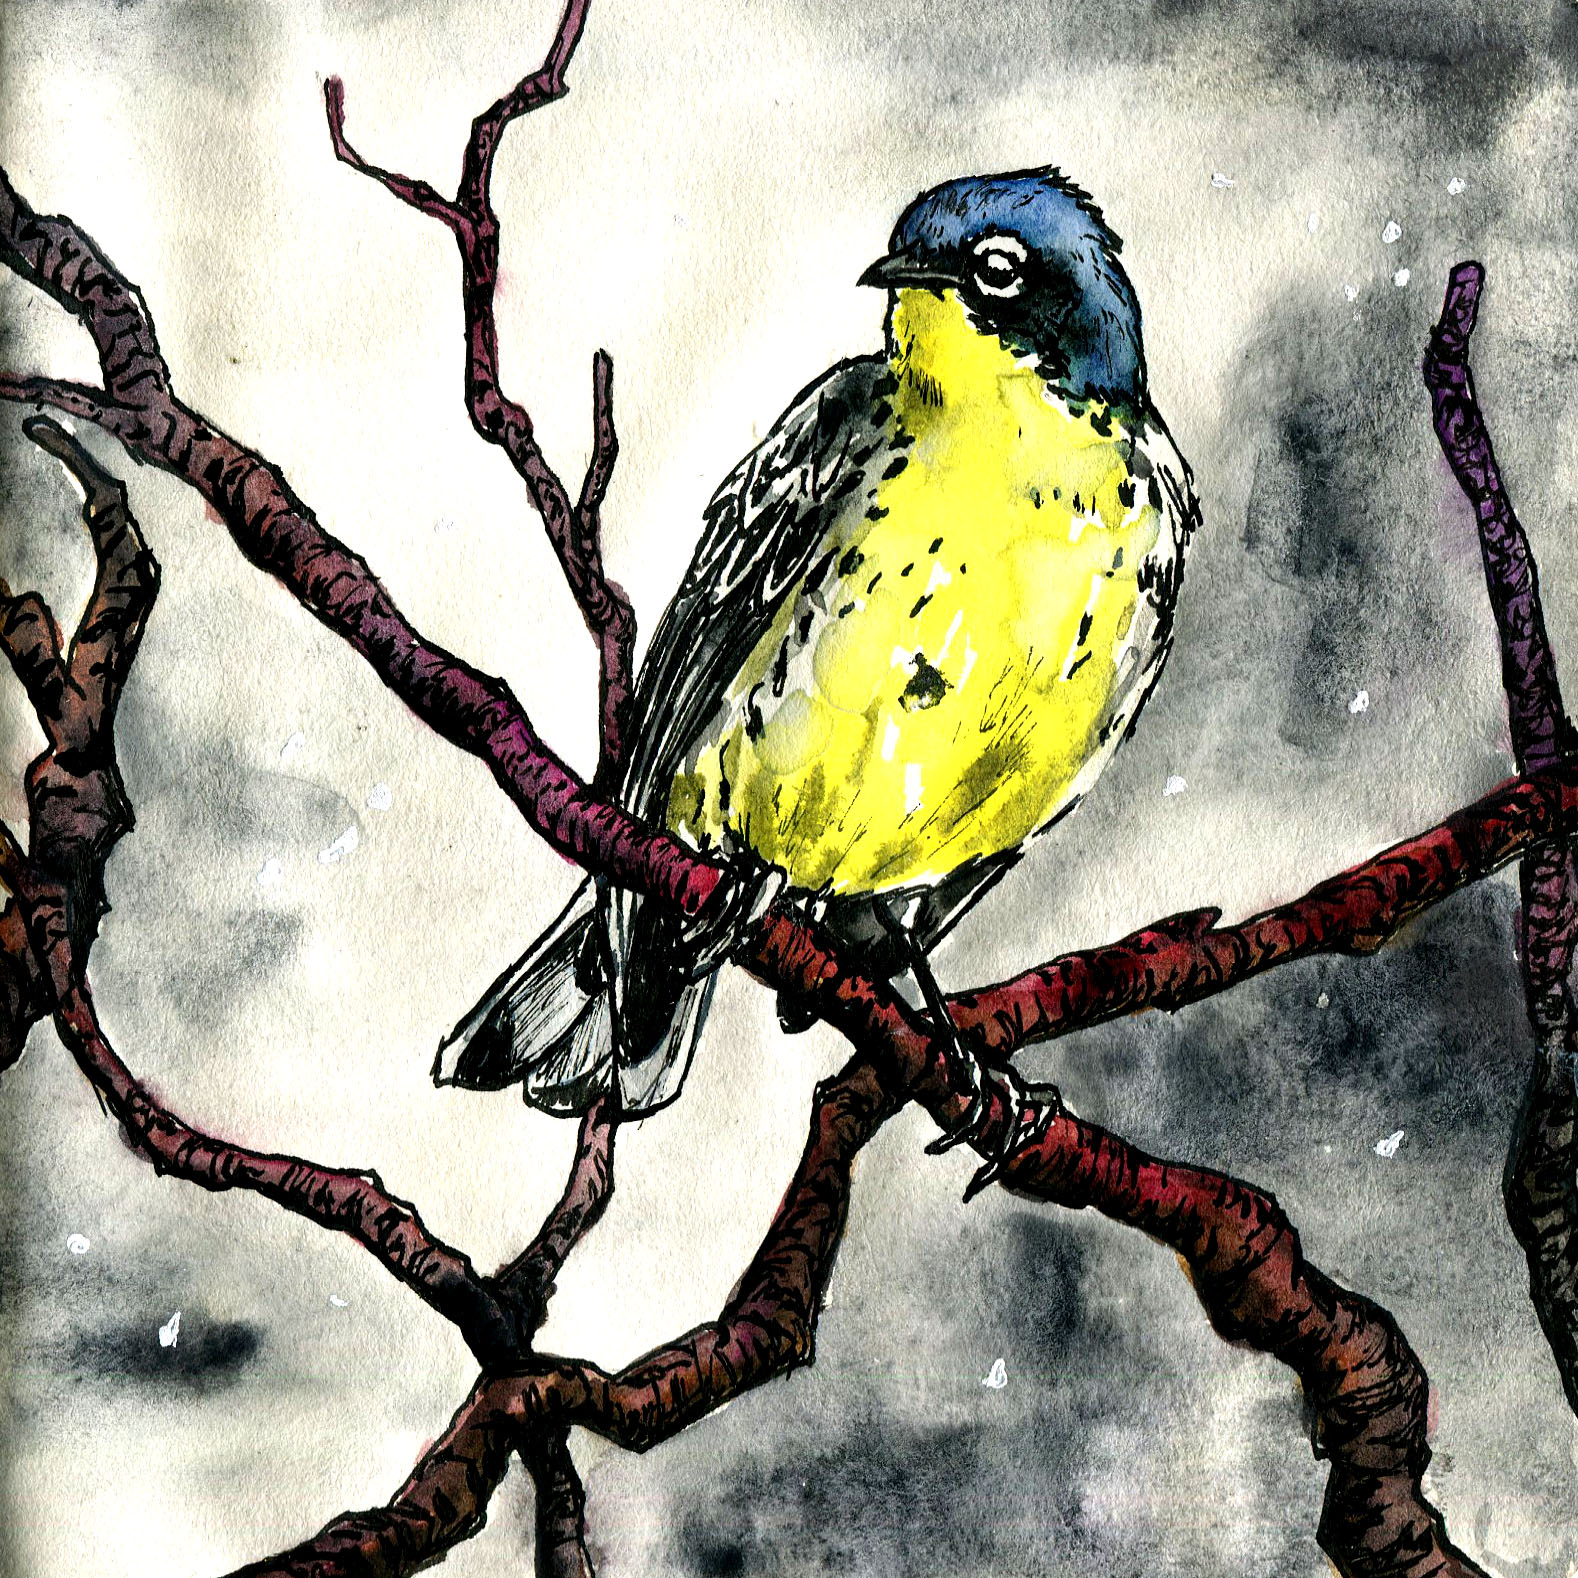 399. Kirtland's Warbler